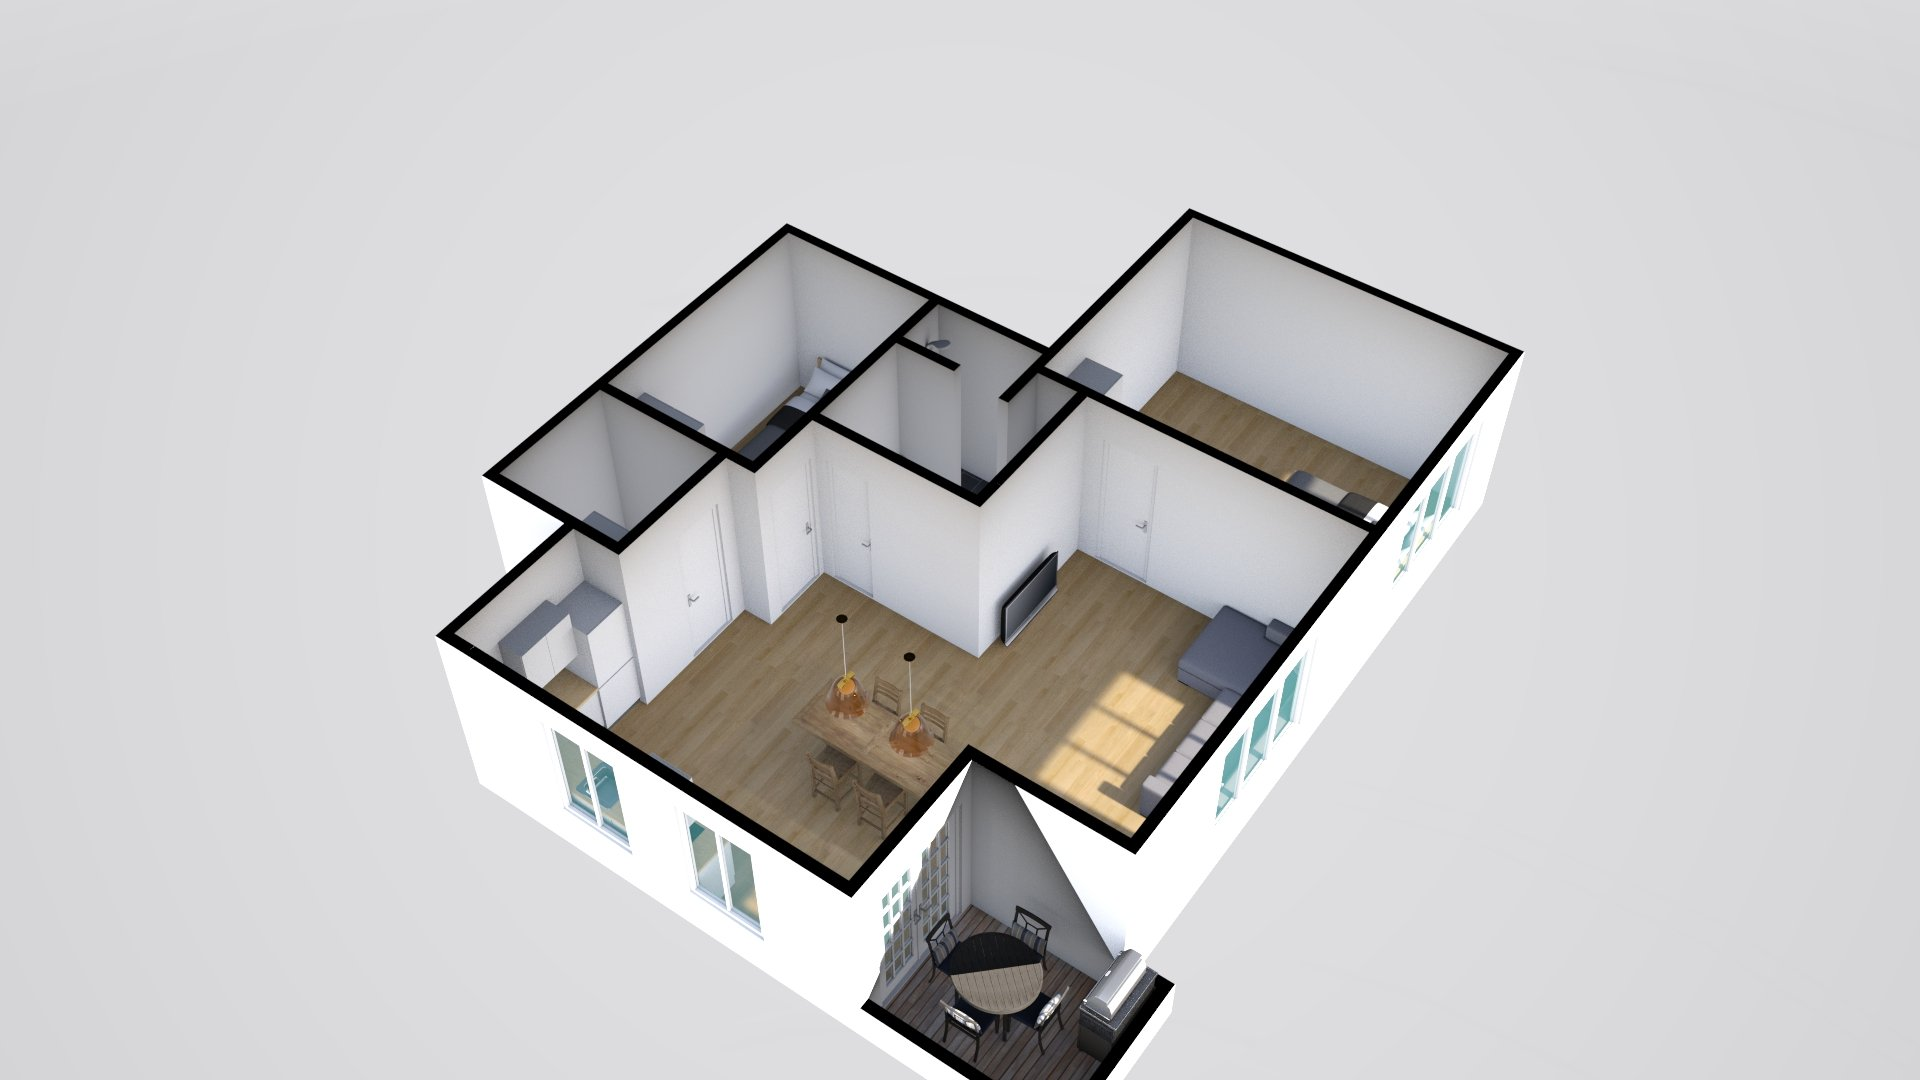 3D 3 Horsensvej 5, Hovedgård